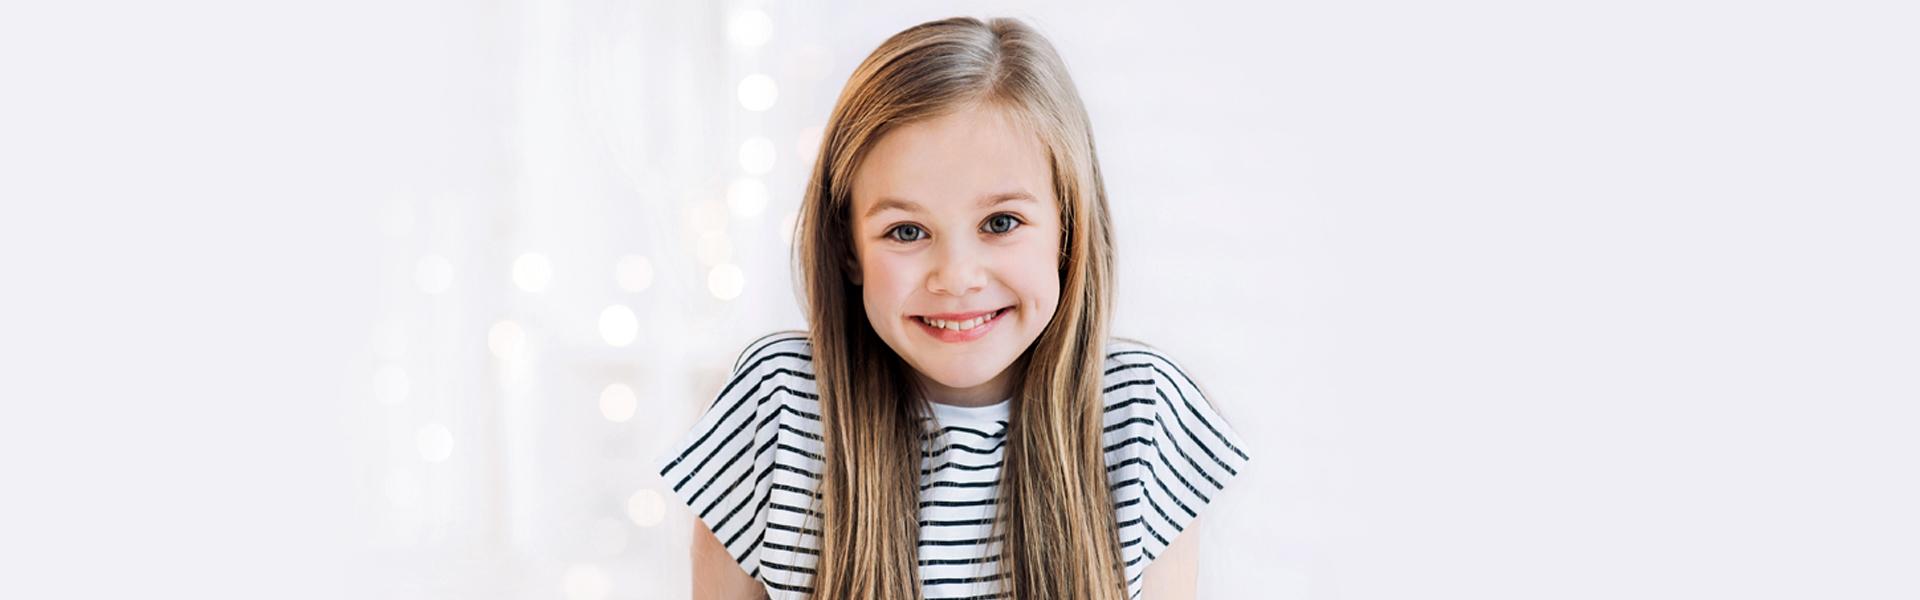 Are Children Eligible for Dental Sealants?